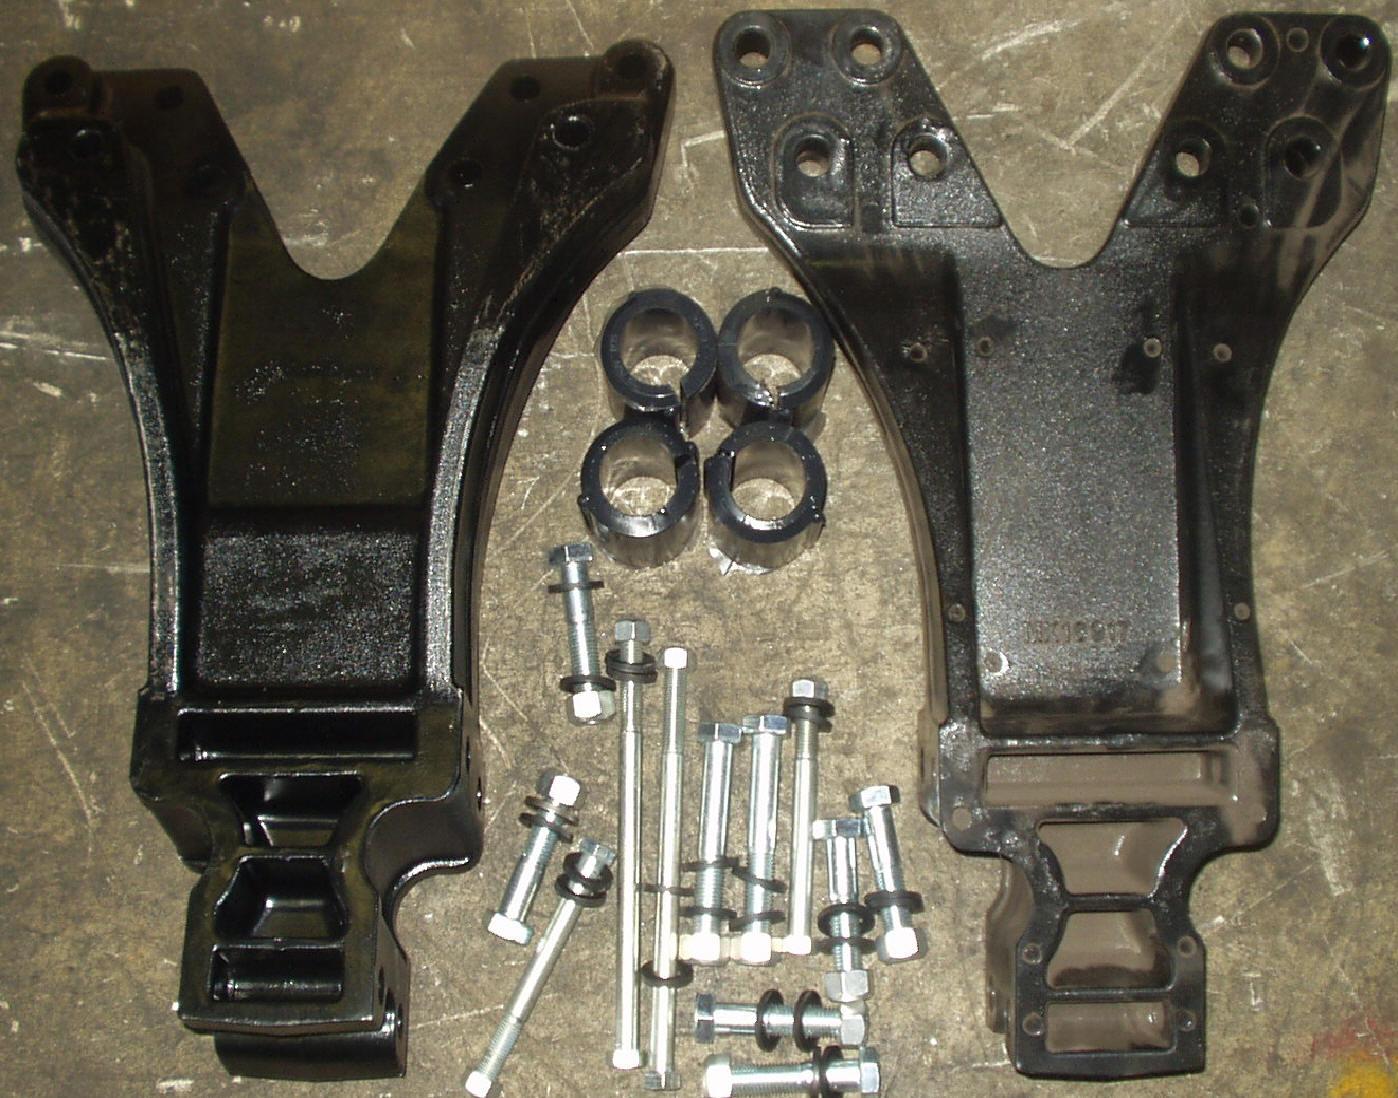 Kenworth Suspension Parts And Ag 400 Kw Torsion Bars